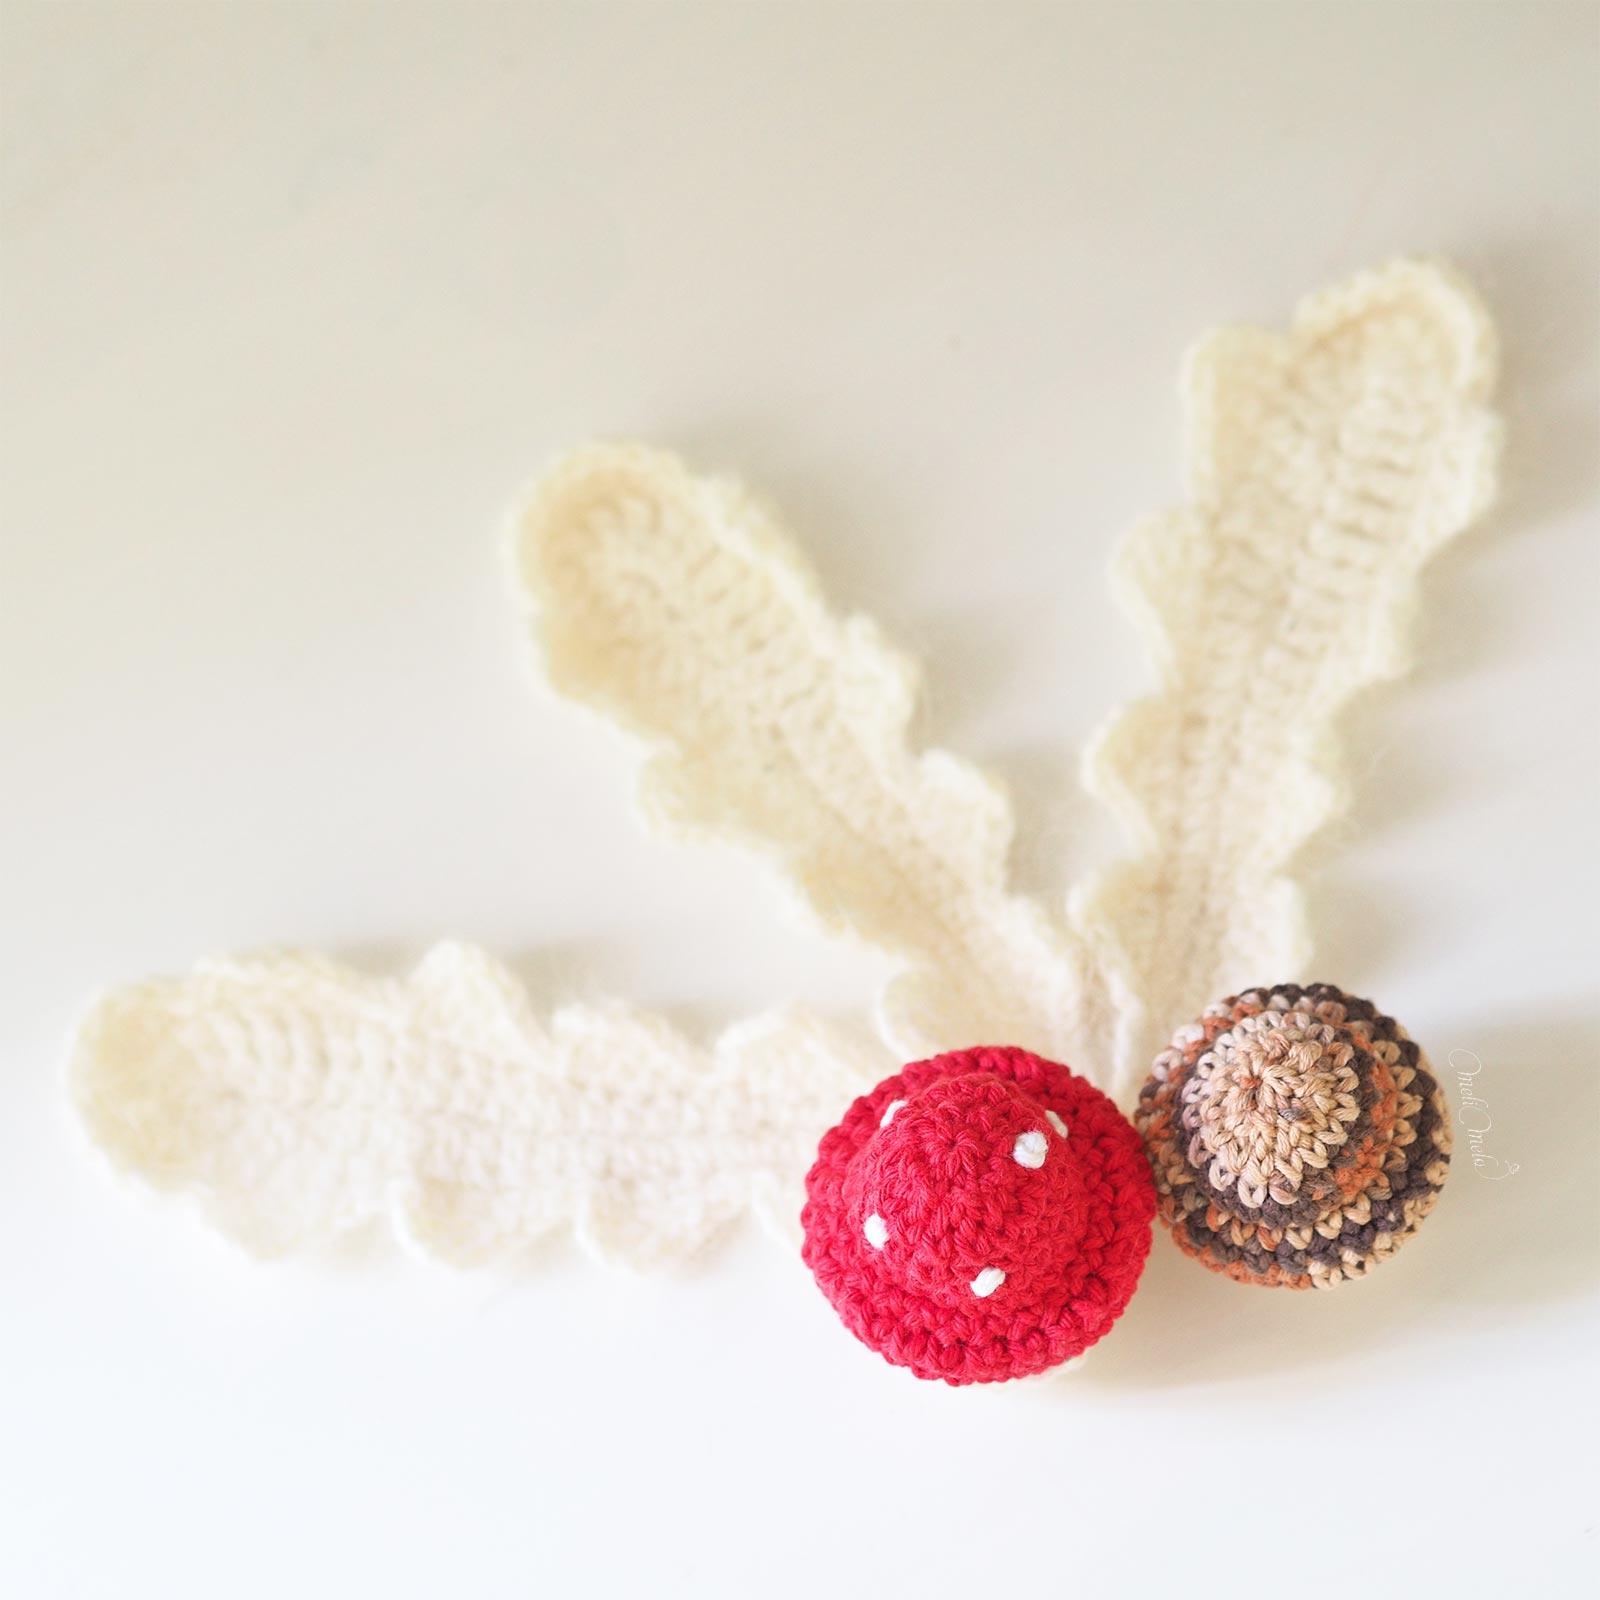 champignon-feuille-crochet-mafabriquebykaro-laboutiquedemelimelo